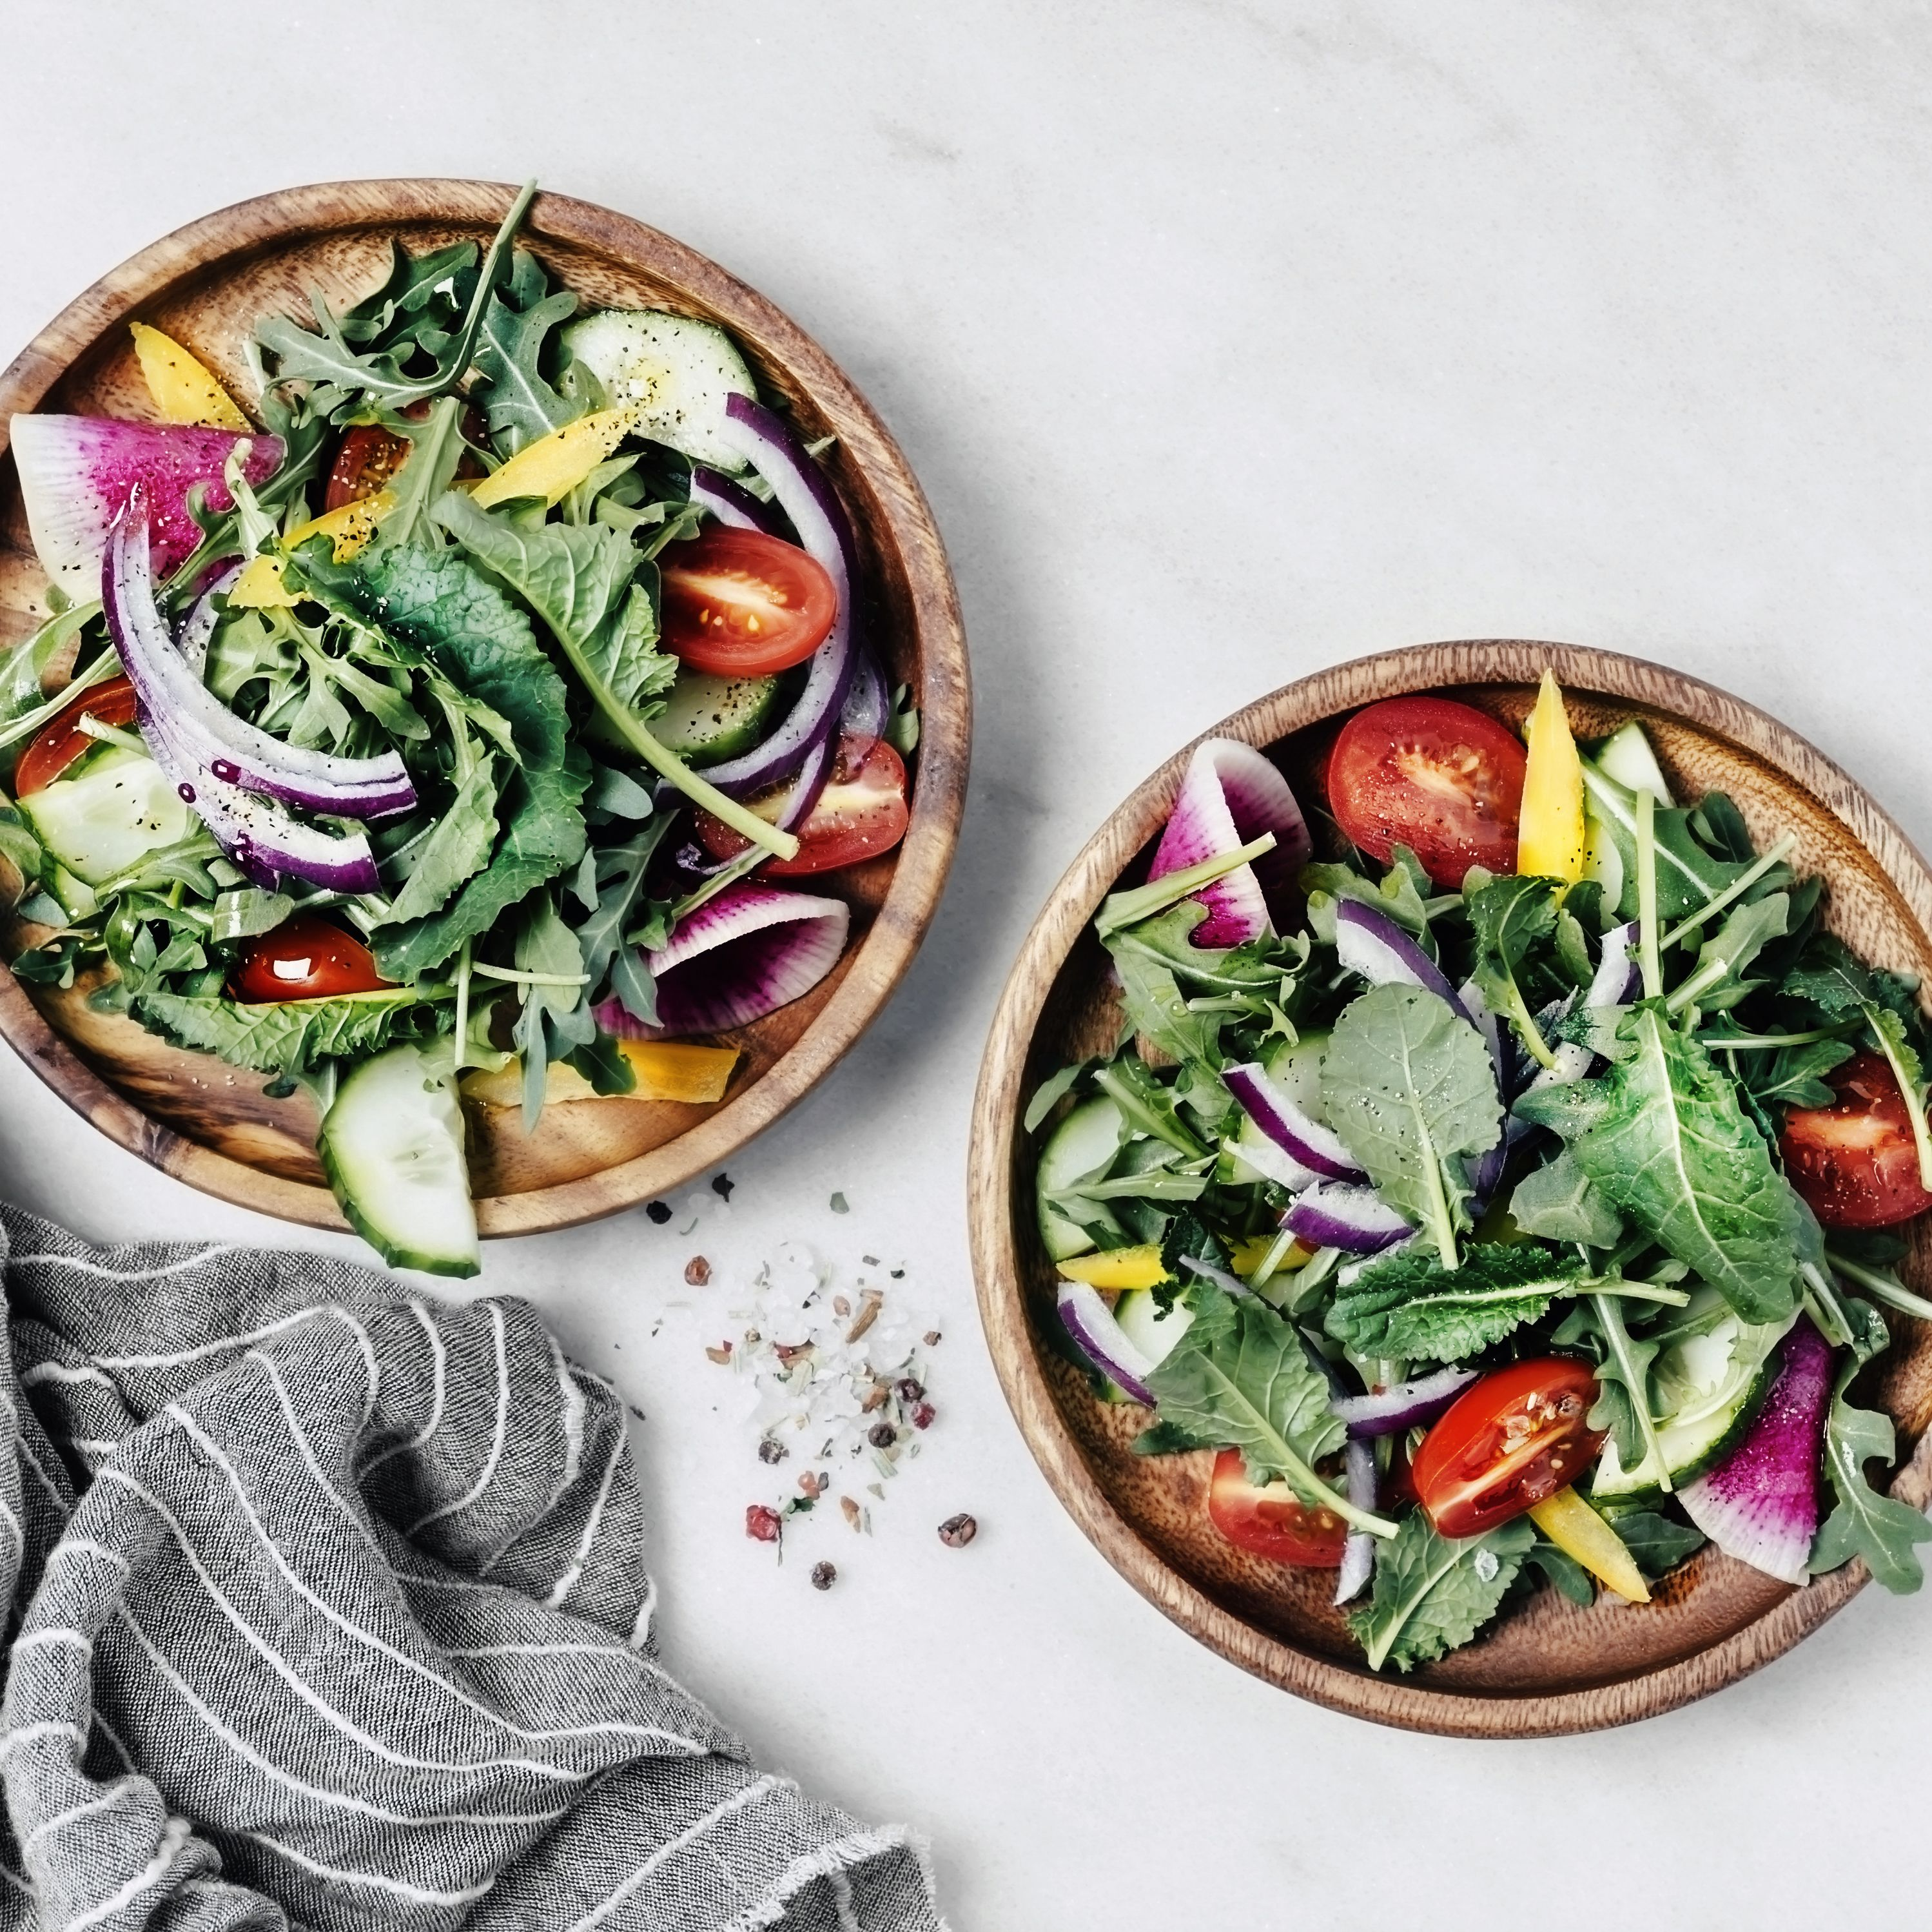 vegatreian diet mistakes chips sugars